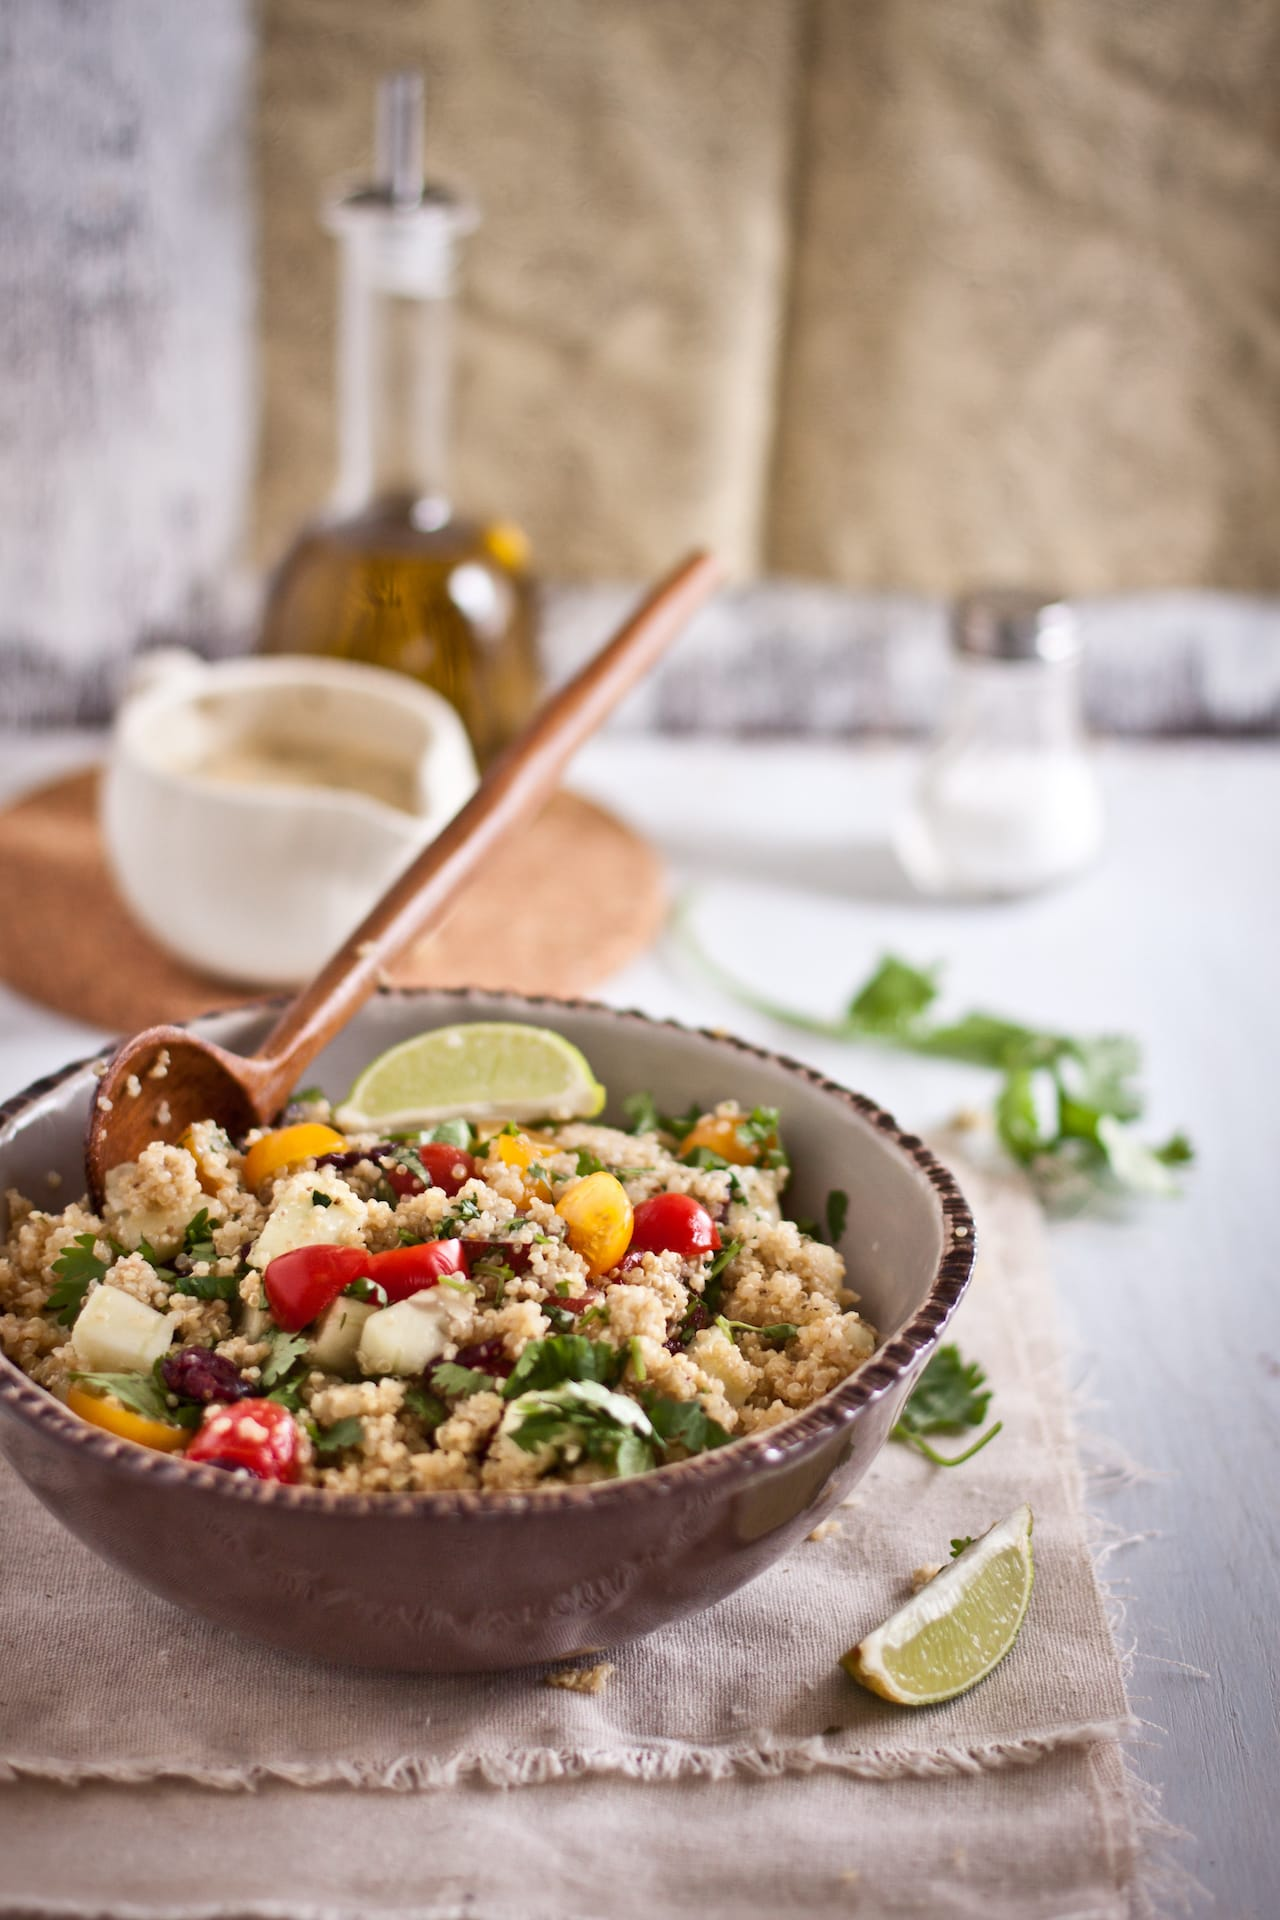 Quinoa Salad with Ricotta and Garam Masala Dressing 2